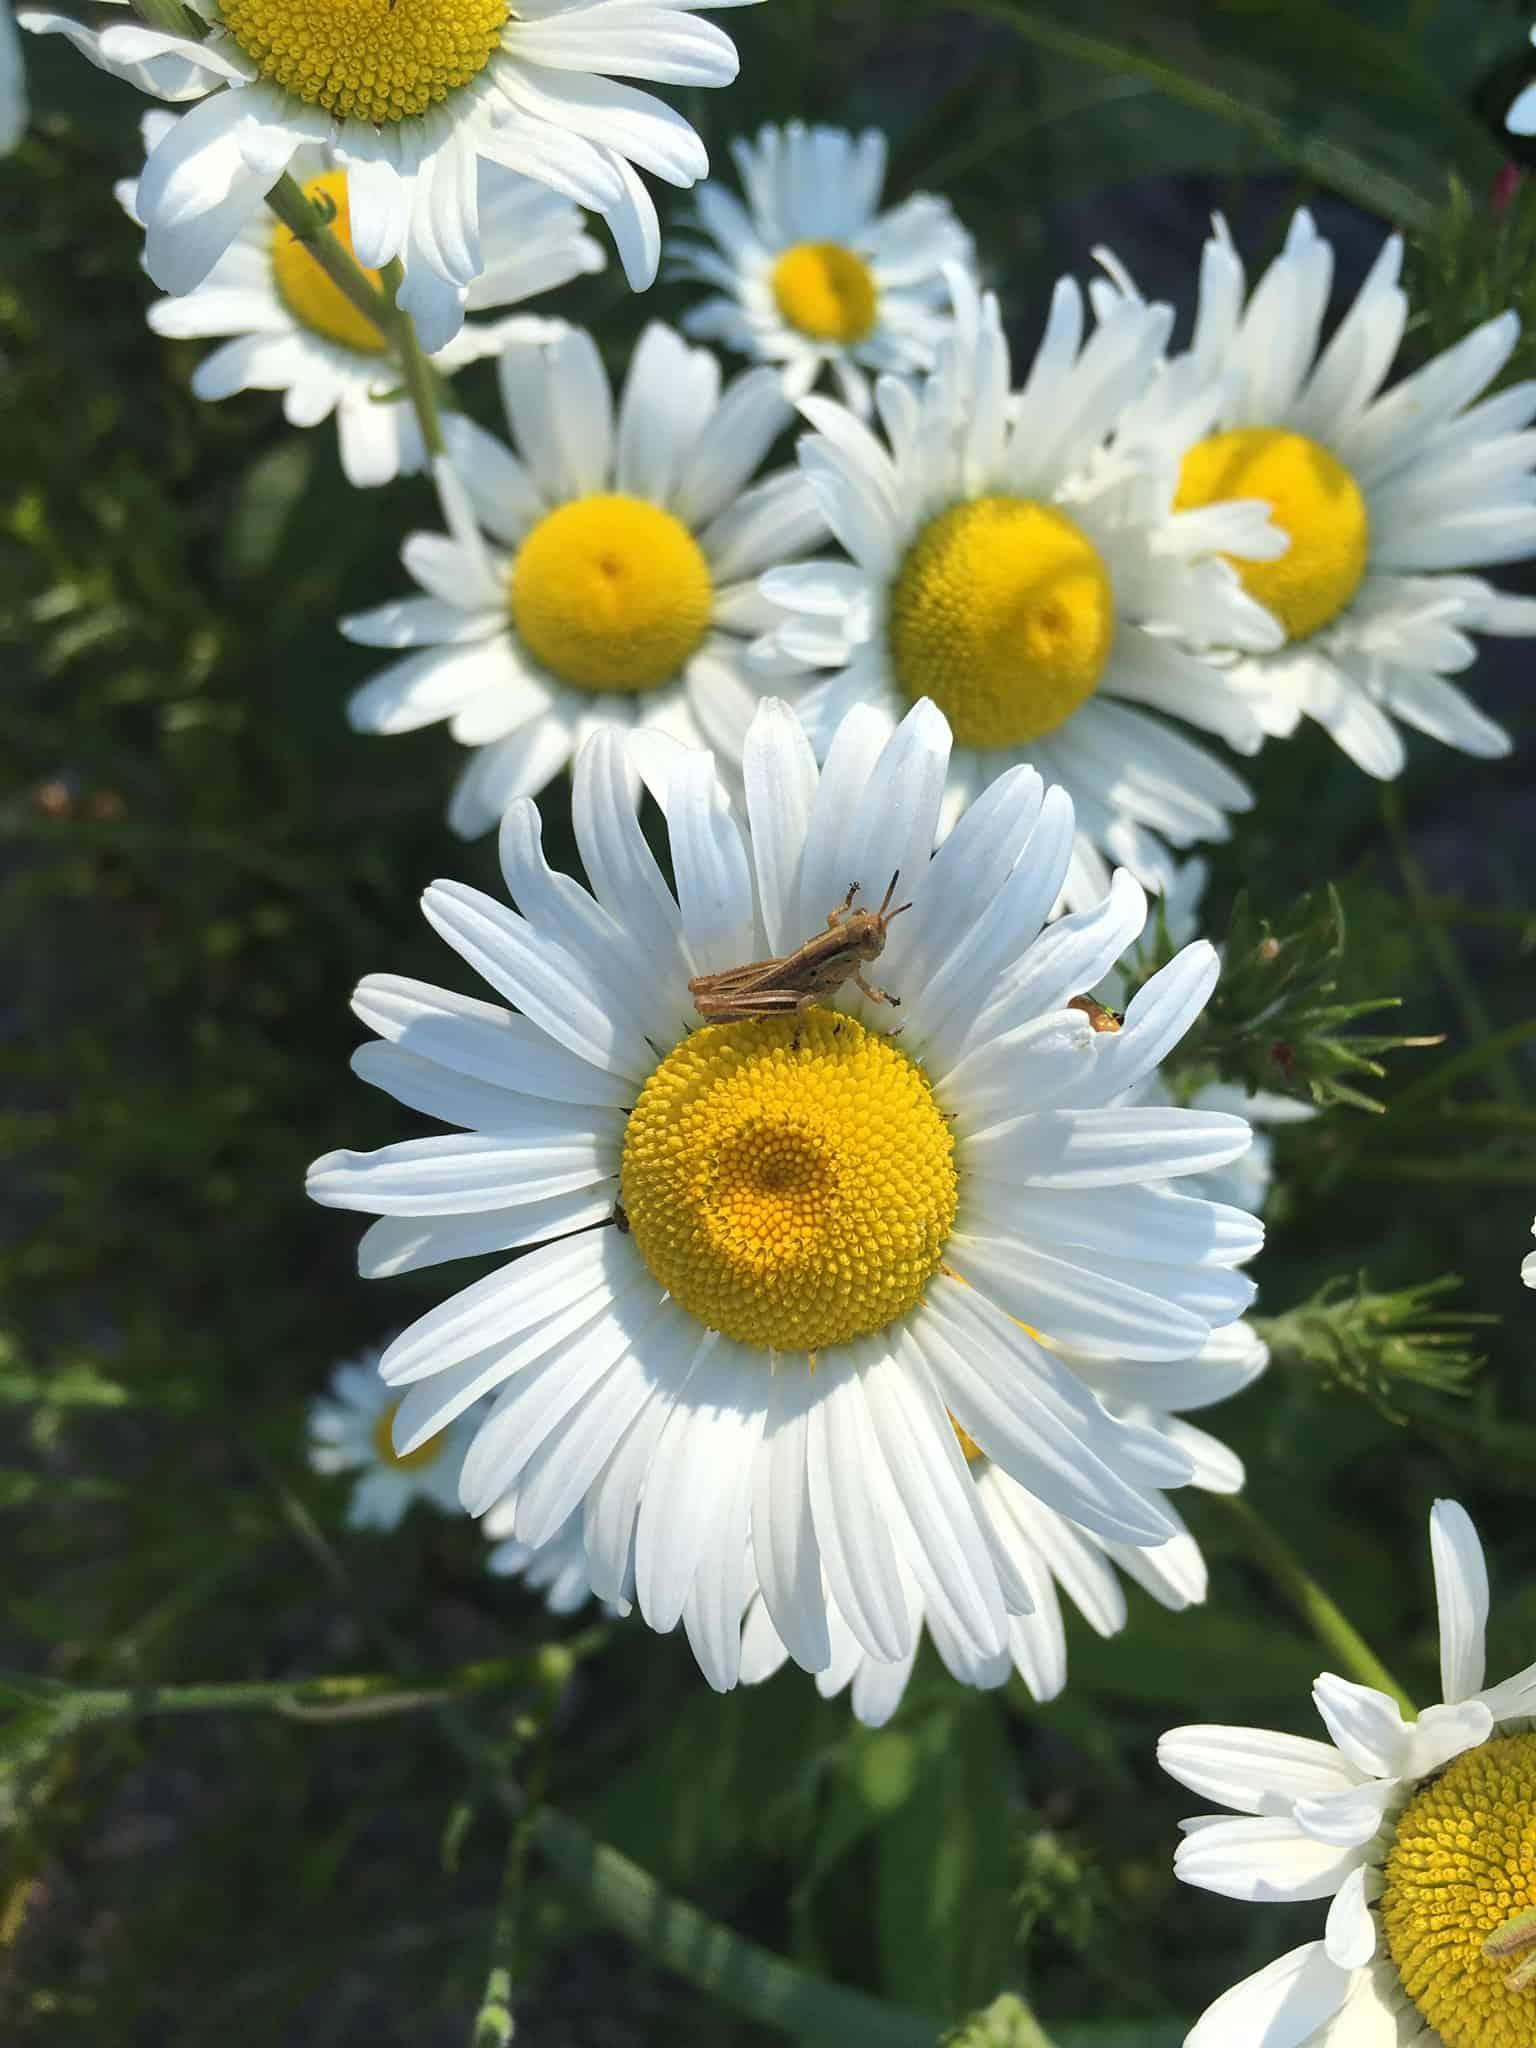 grasshopper and daisy